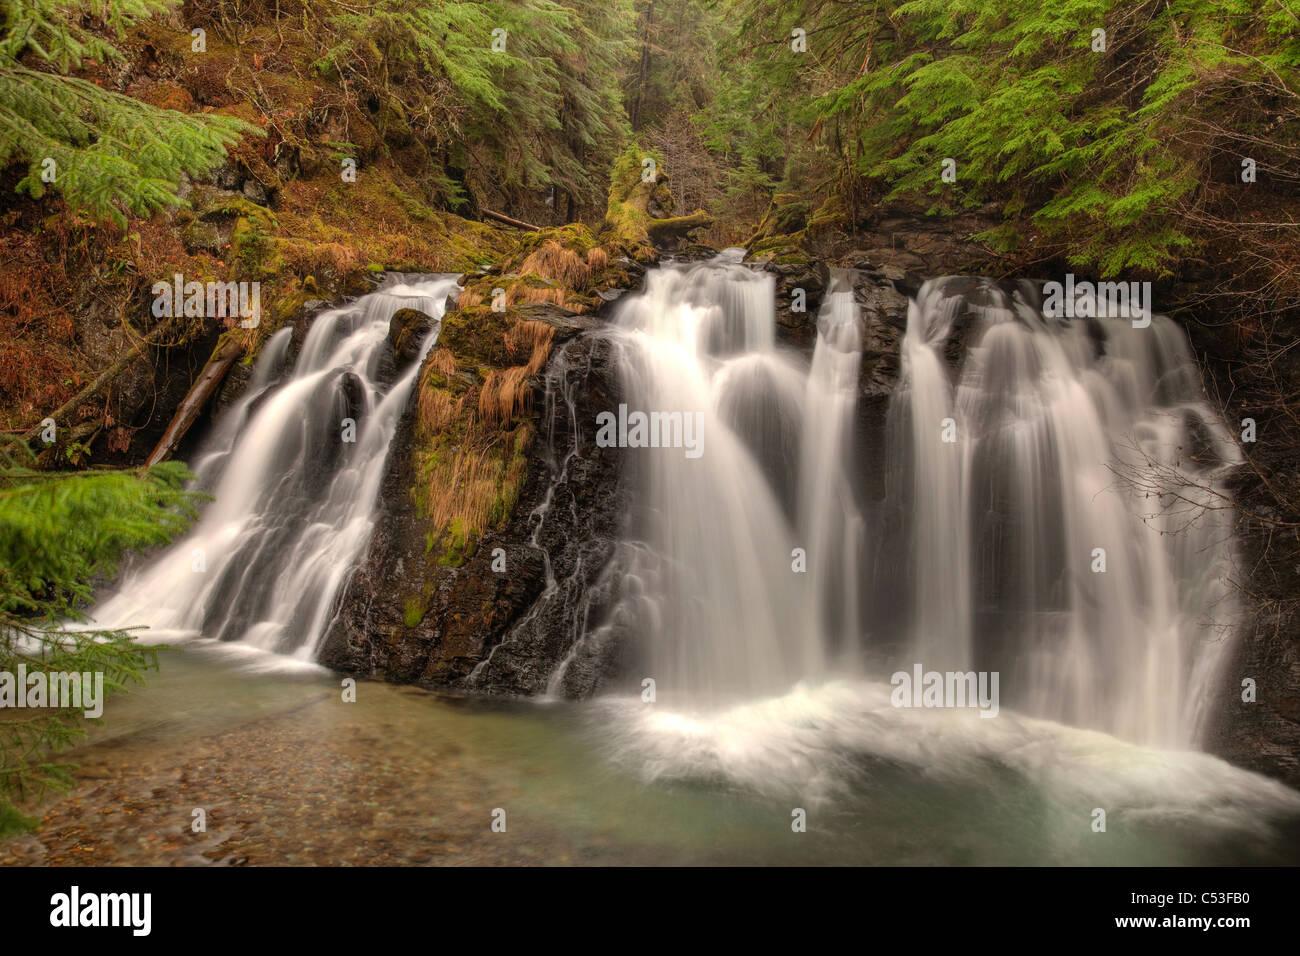 Blurred motion of Salmon Creek Falls near Juneau, Southeast Alaska, Summer. HDR - Stock Image